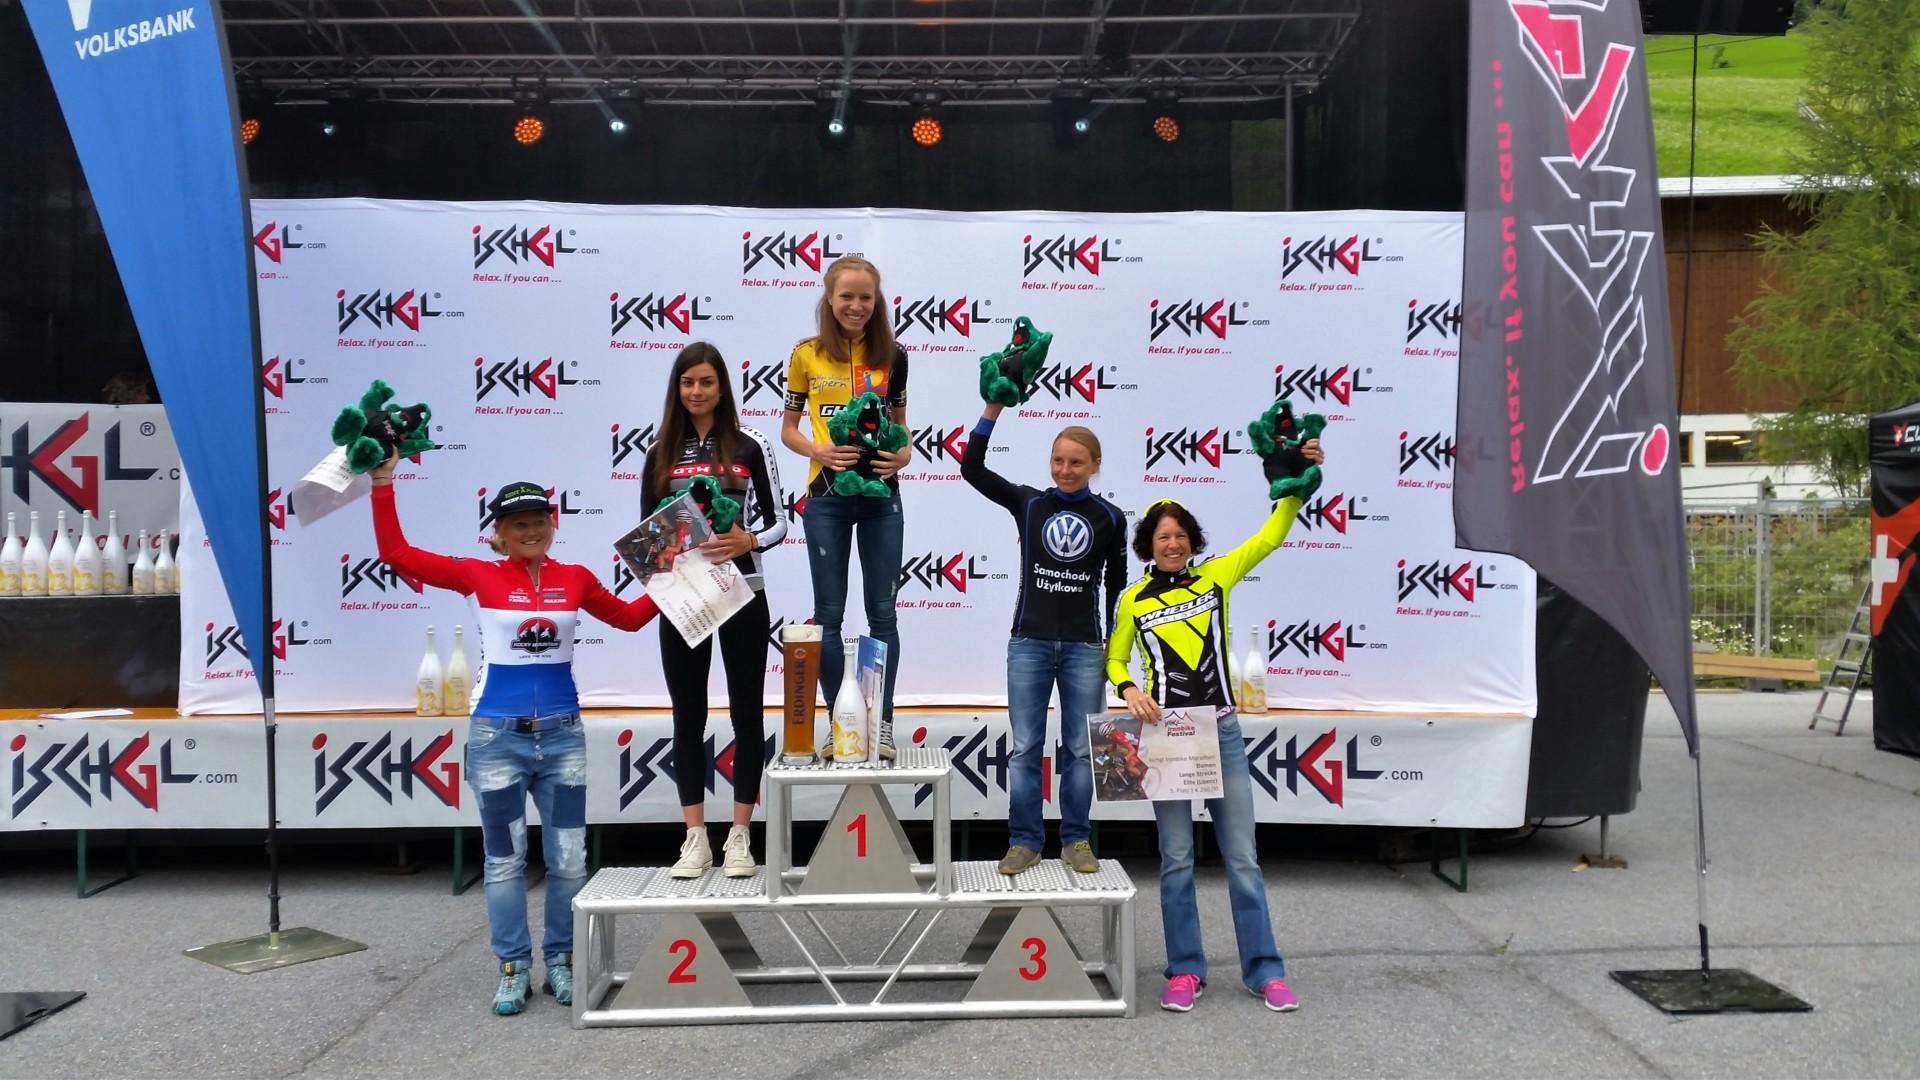 Michalina Ziółkowska (Volkswagen Samochody Użytkowe MTB Team) – Ischgl Ironbike Marathon, Austria